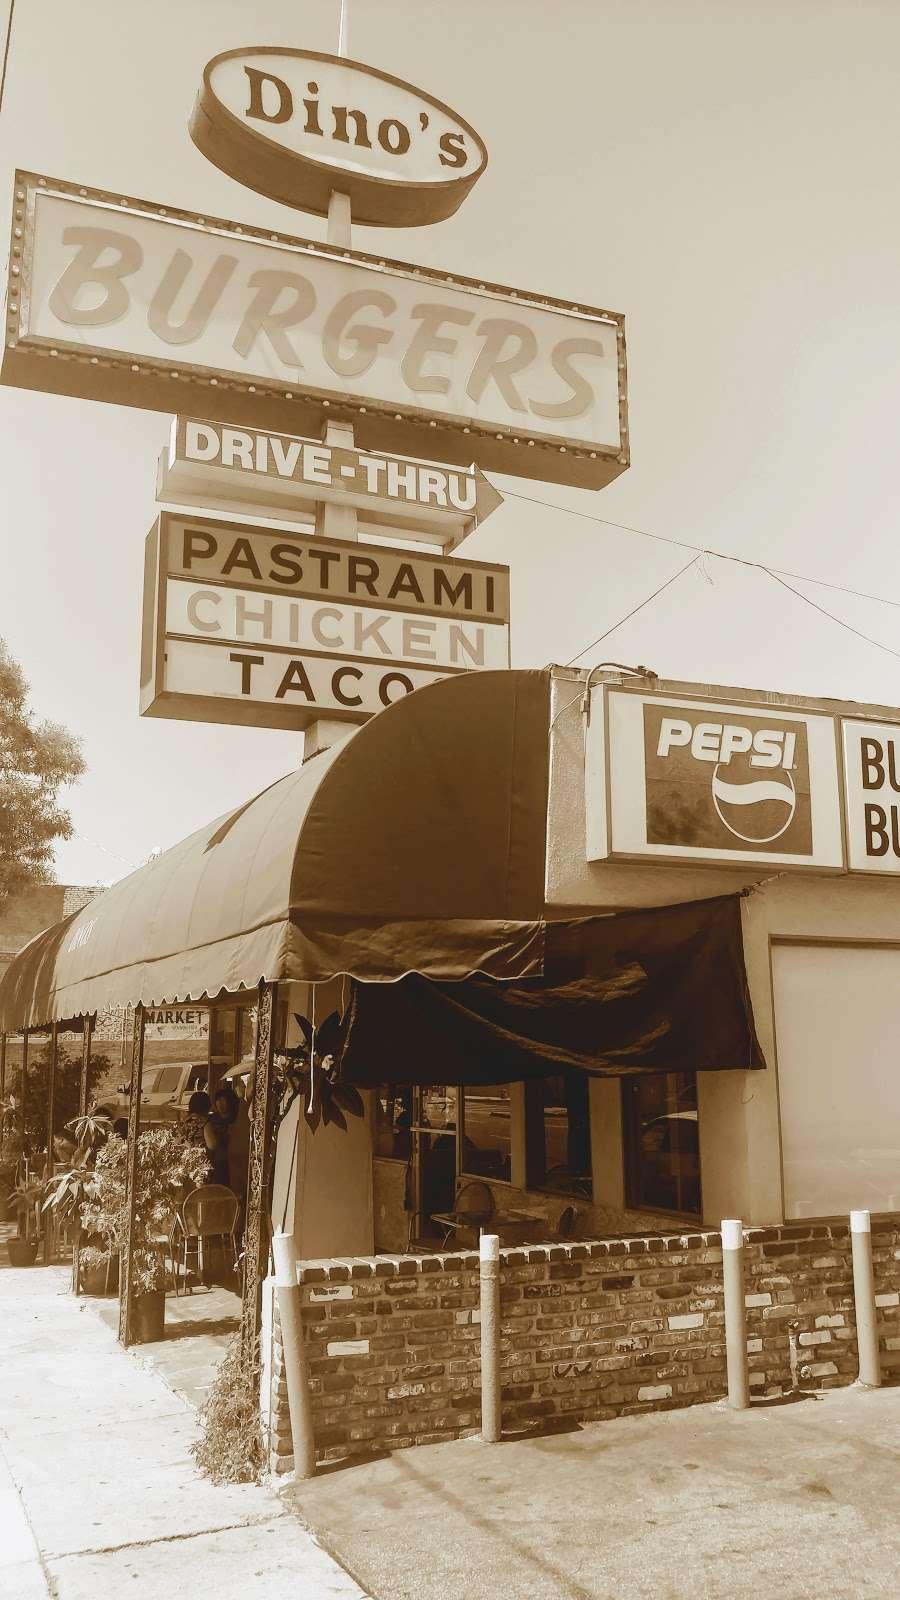 Dinos - restaurant    Photo 3 of 10   Address: 2817 N Main St, Los Angeles, CA 90031, USA   Phone: (323) 223-1843